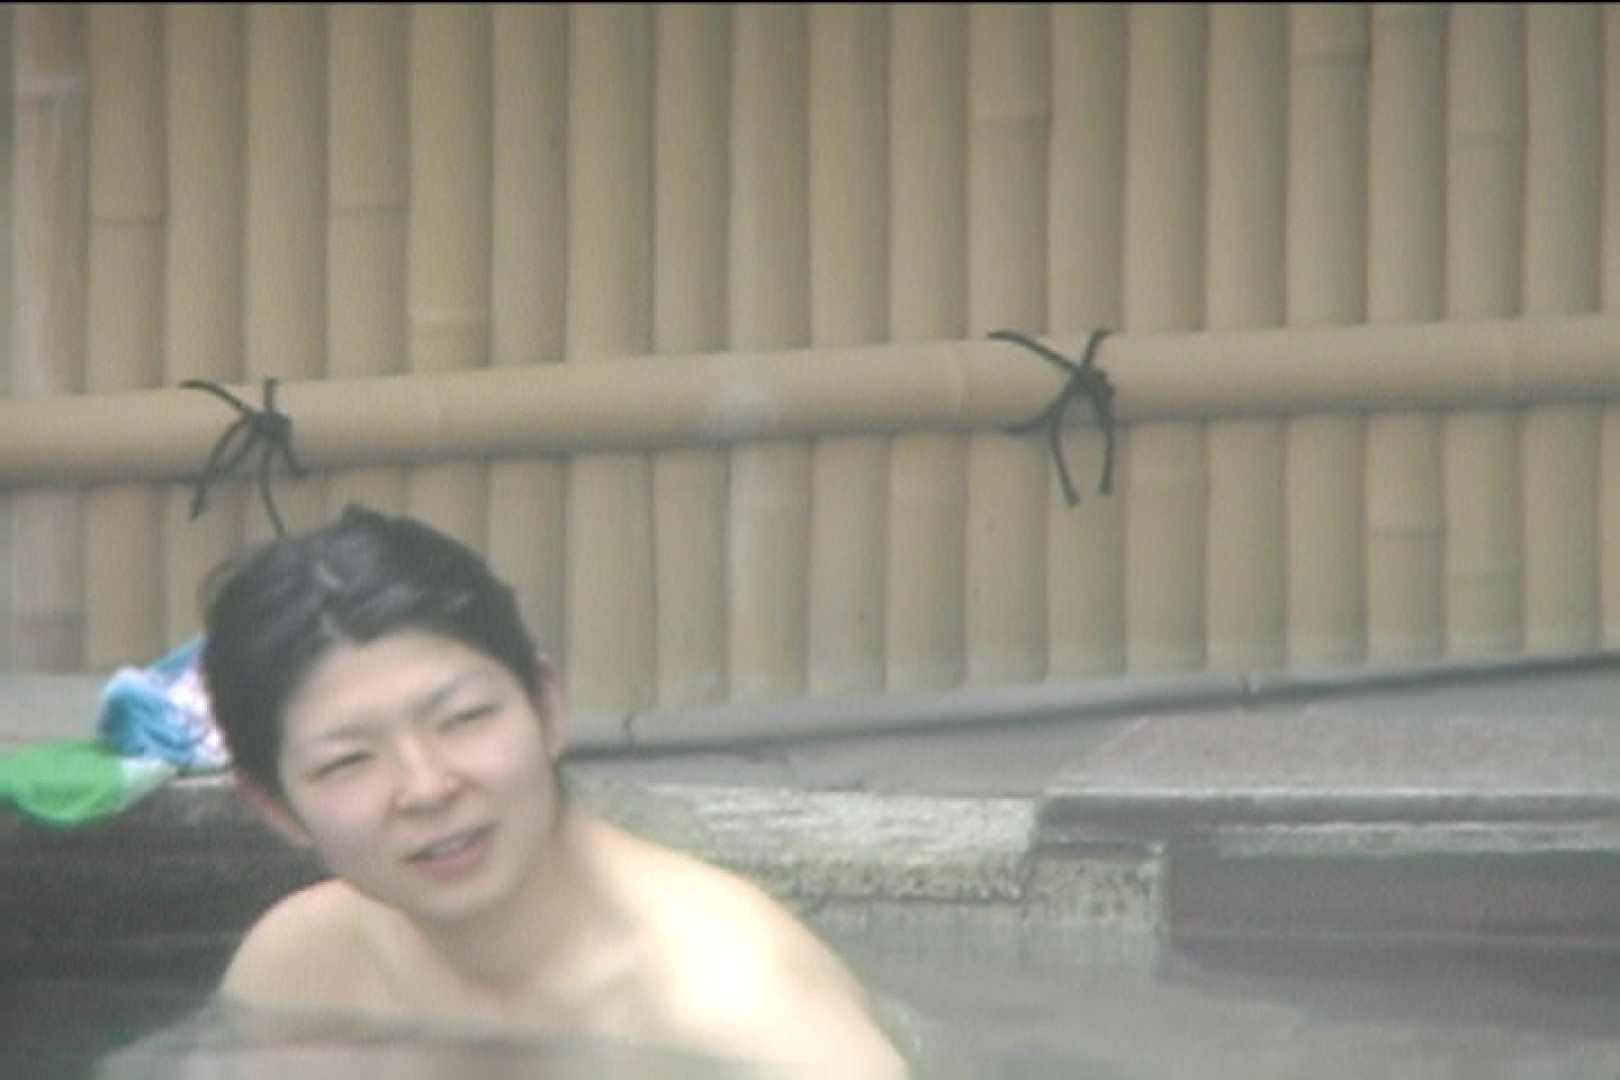 Aquaな露天風呂Vol.139 盗撮シリーズ | 露天風呂編  79PIX 5